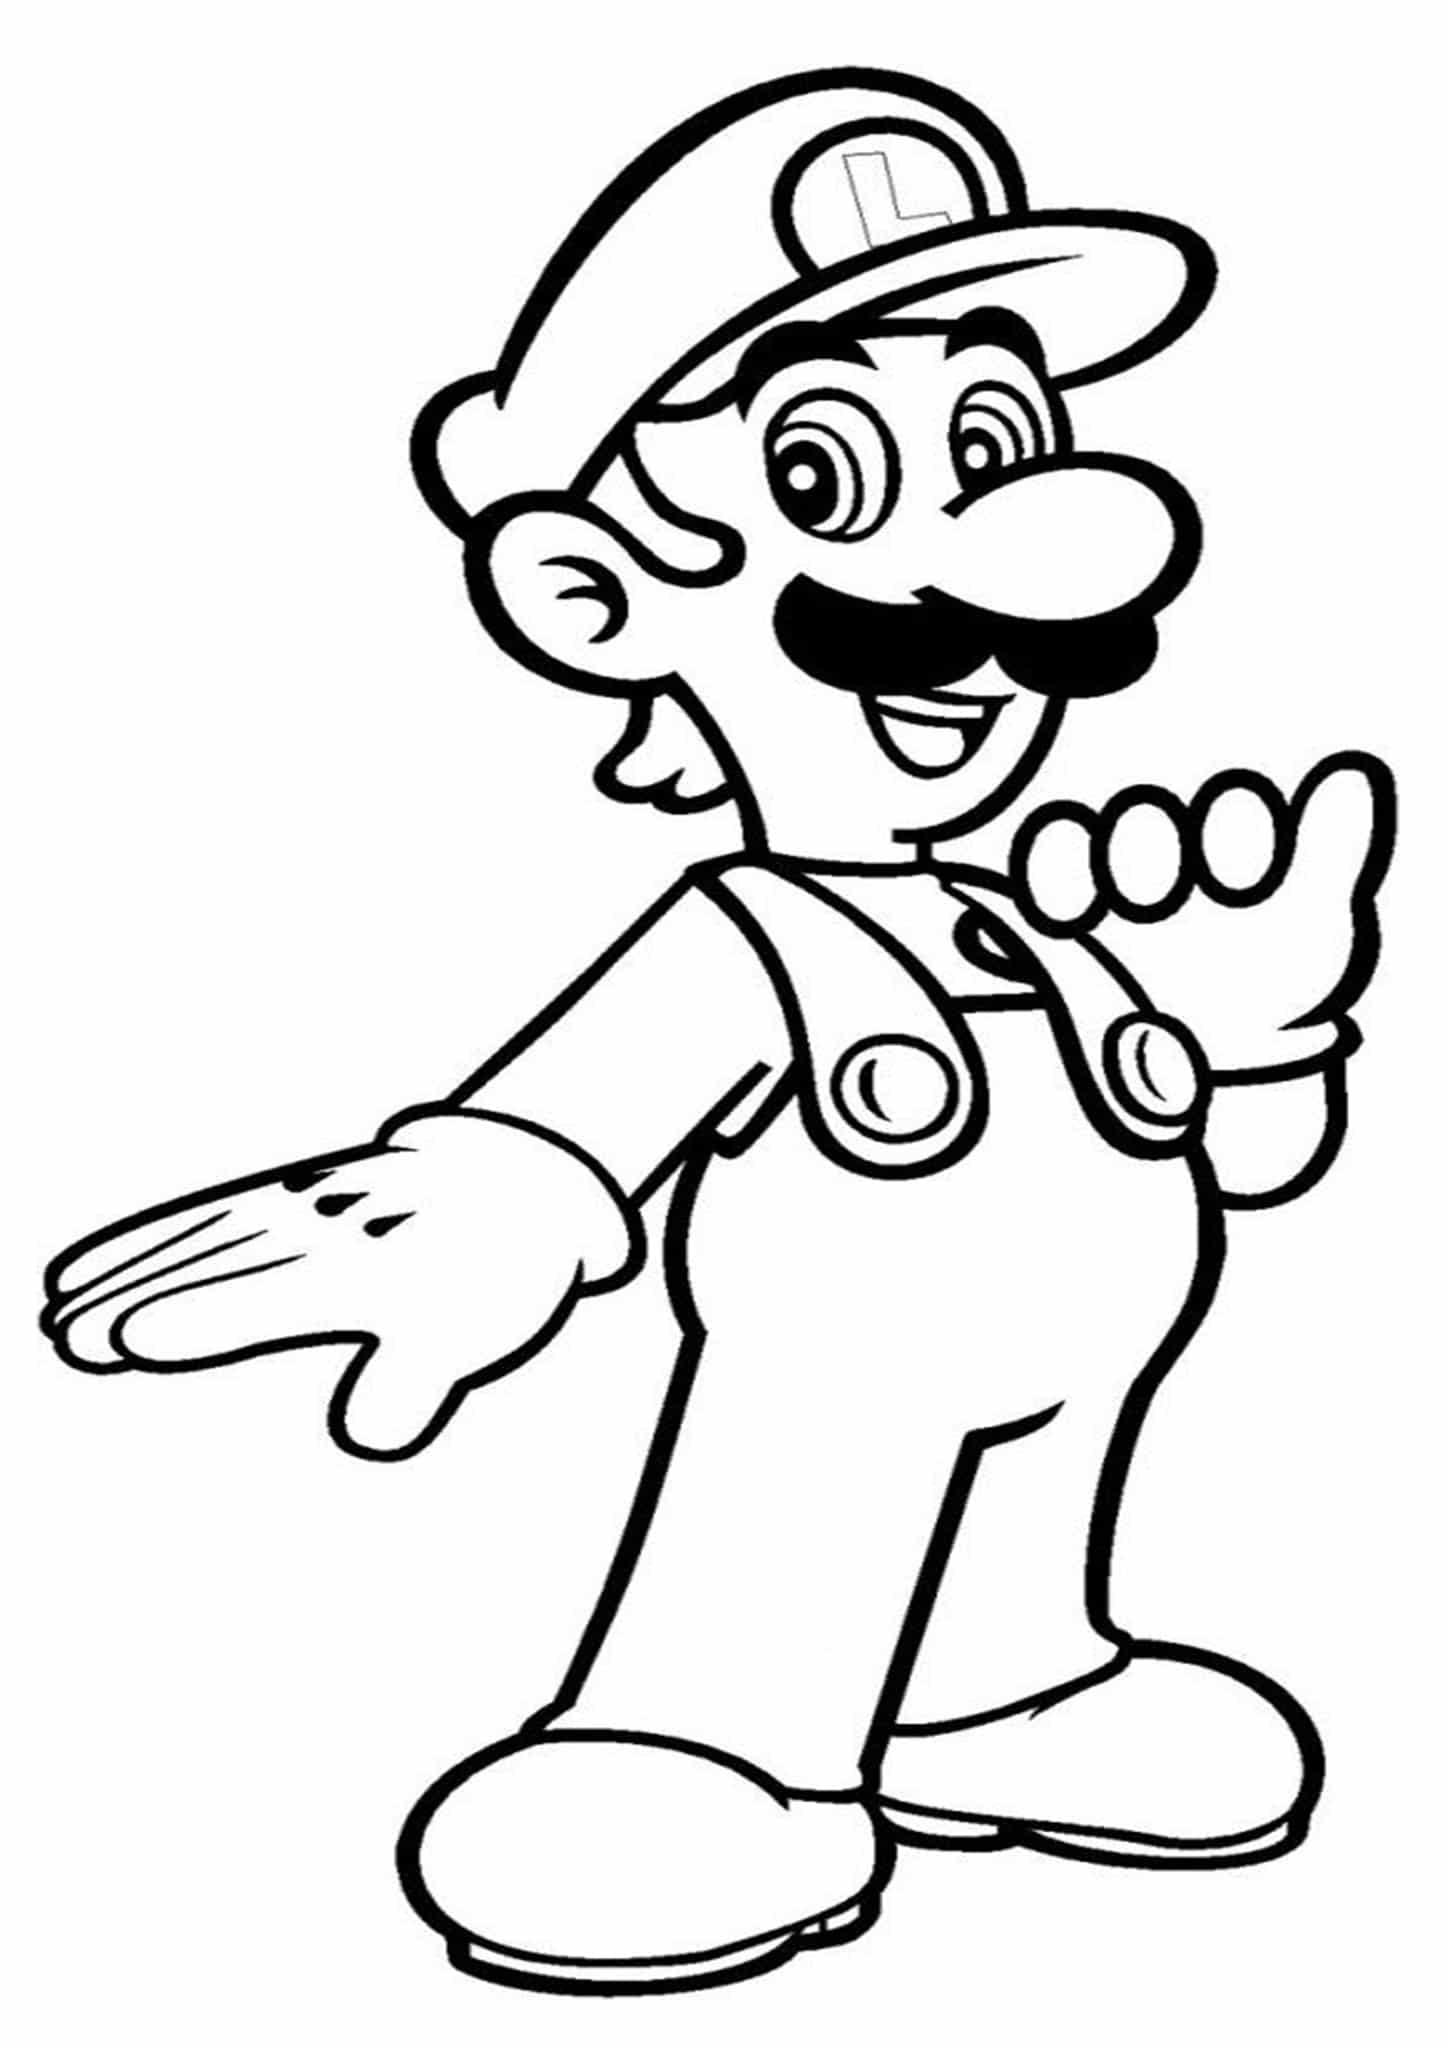 Free & Easy To Print Mario Coloring Page - Tulamama